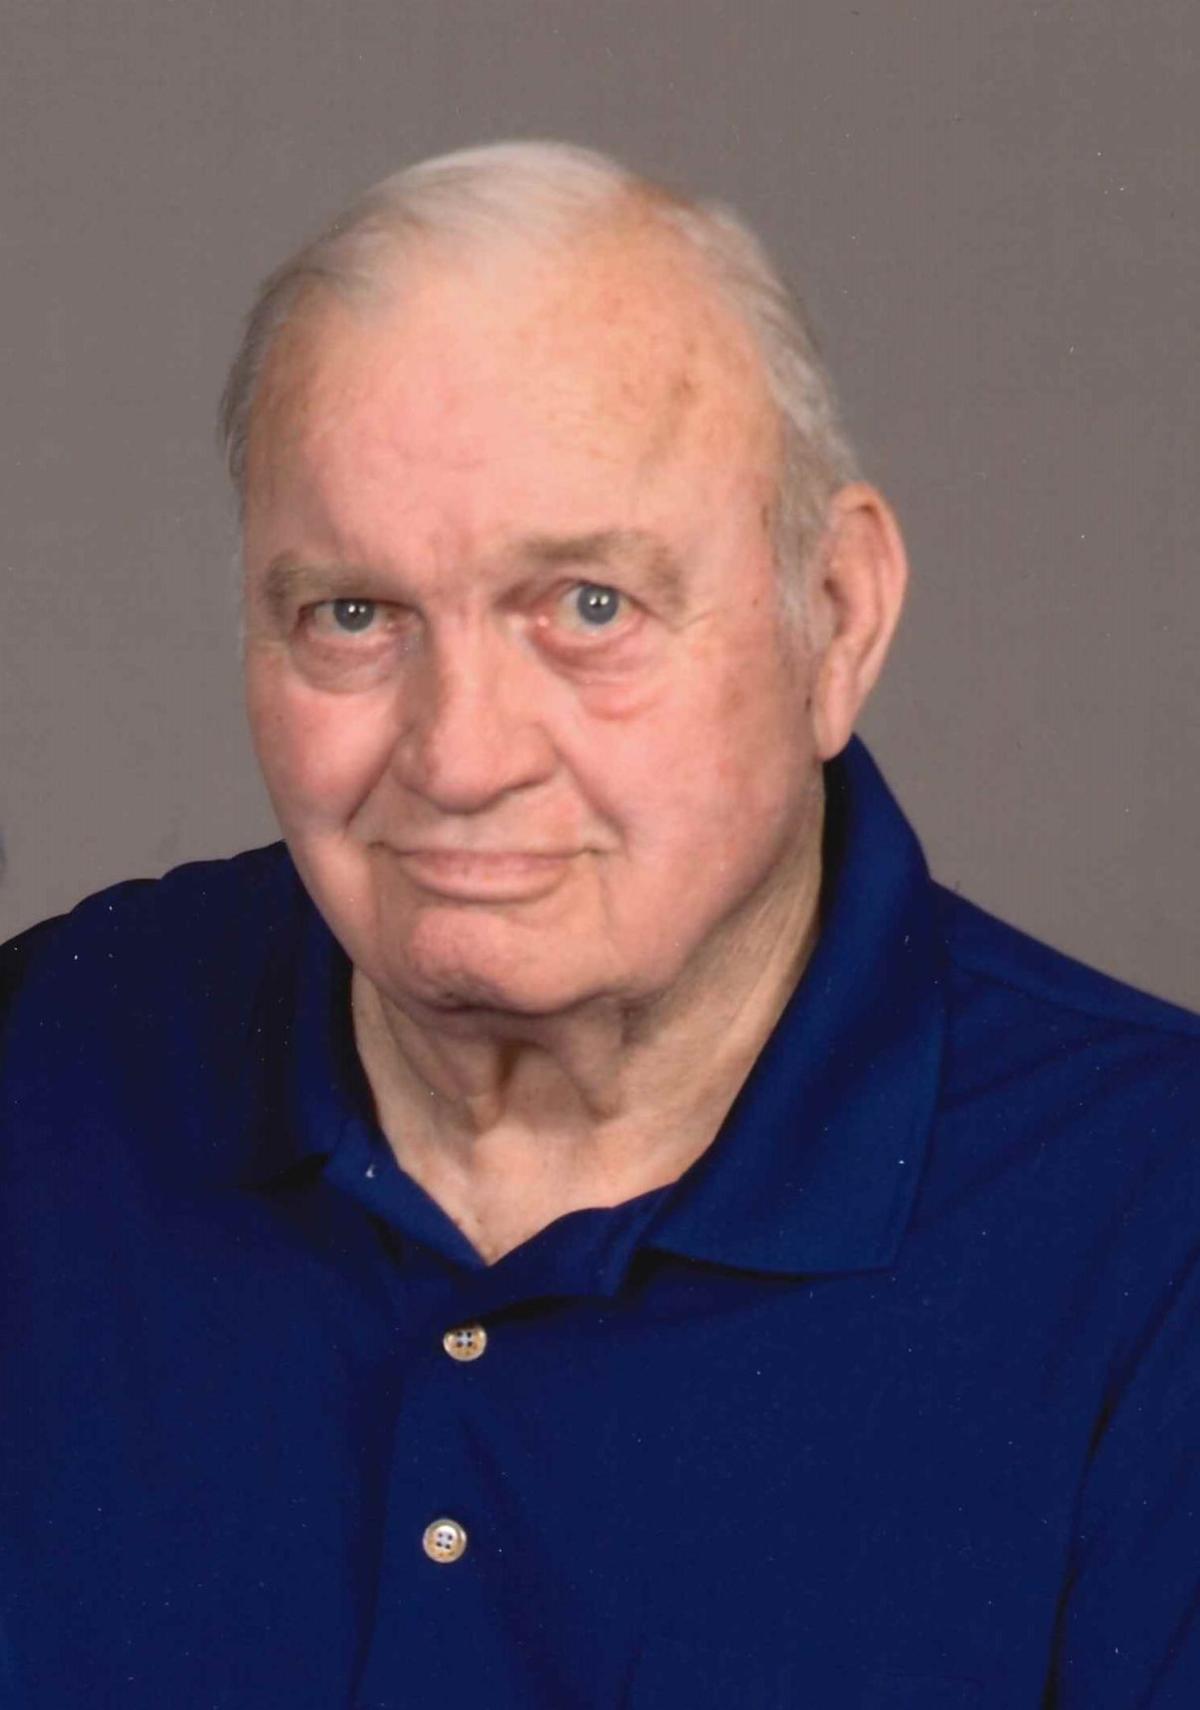 Richard D. (Dick) Irvin, 85, of Shenandoah, Iowa